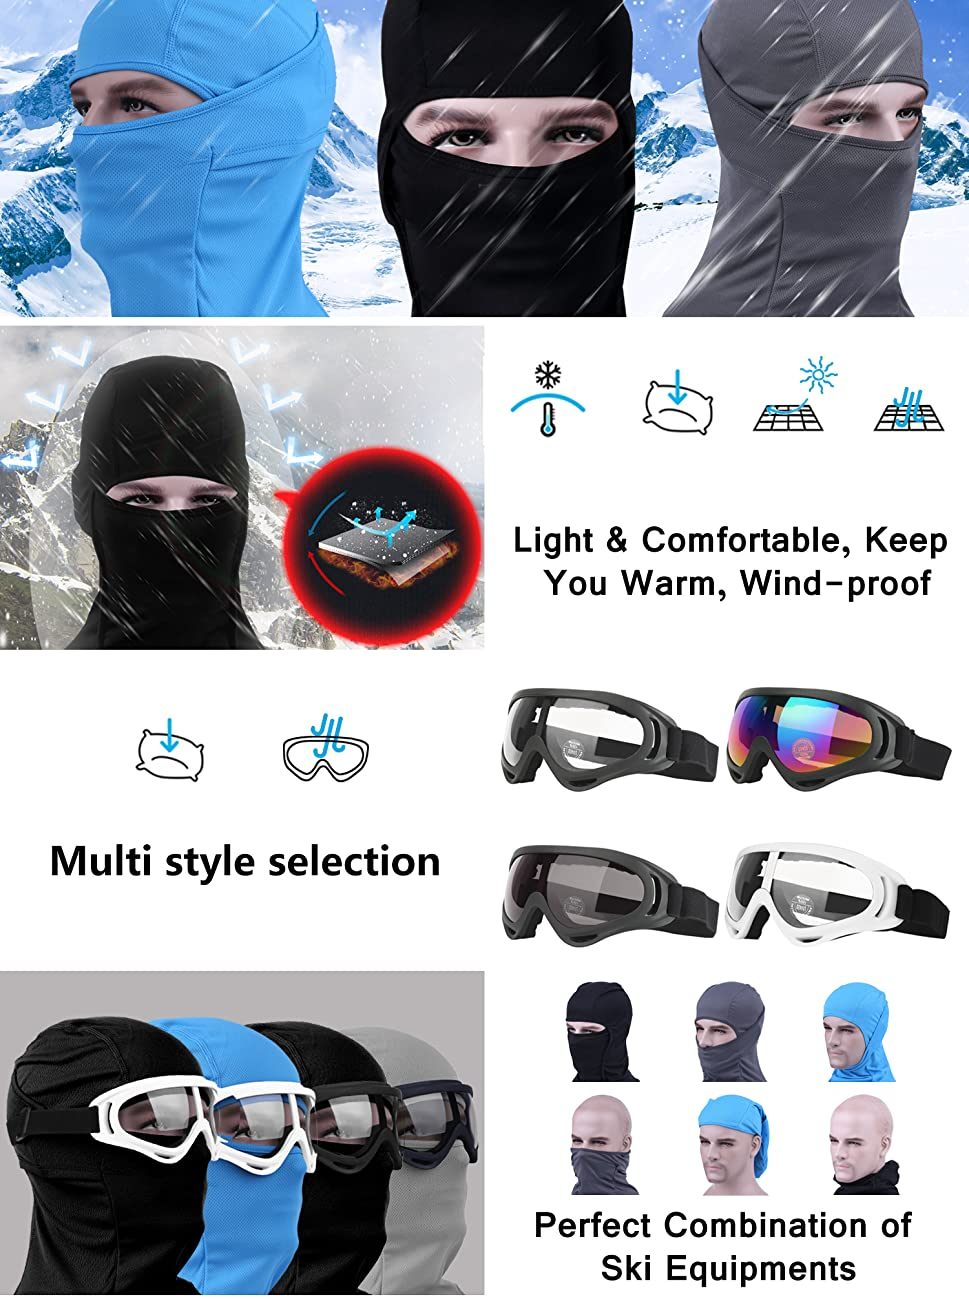 Amazon.com : Balaclava & Ski Goggles Sets, Ultralight